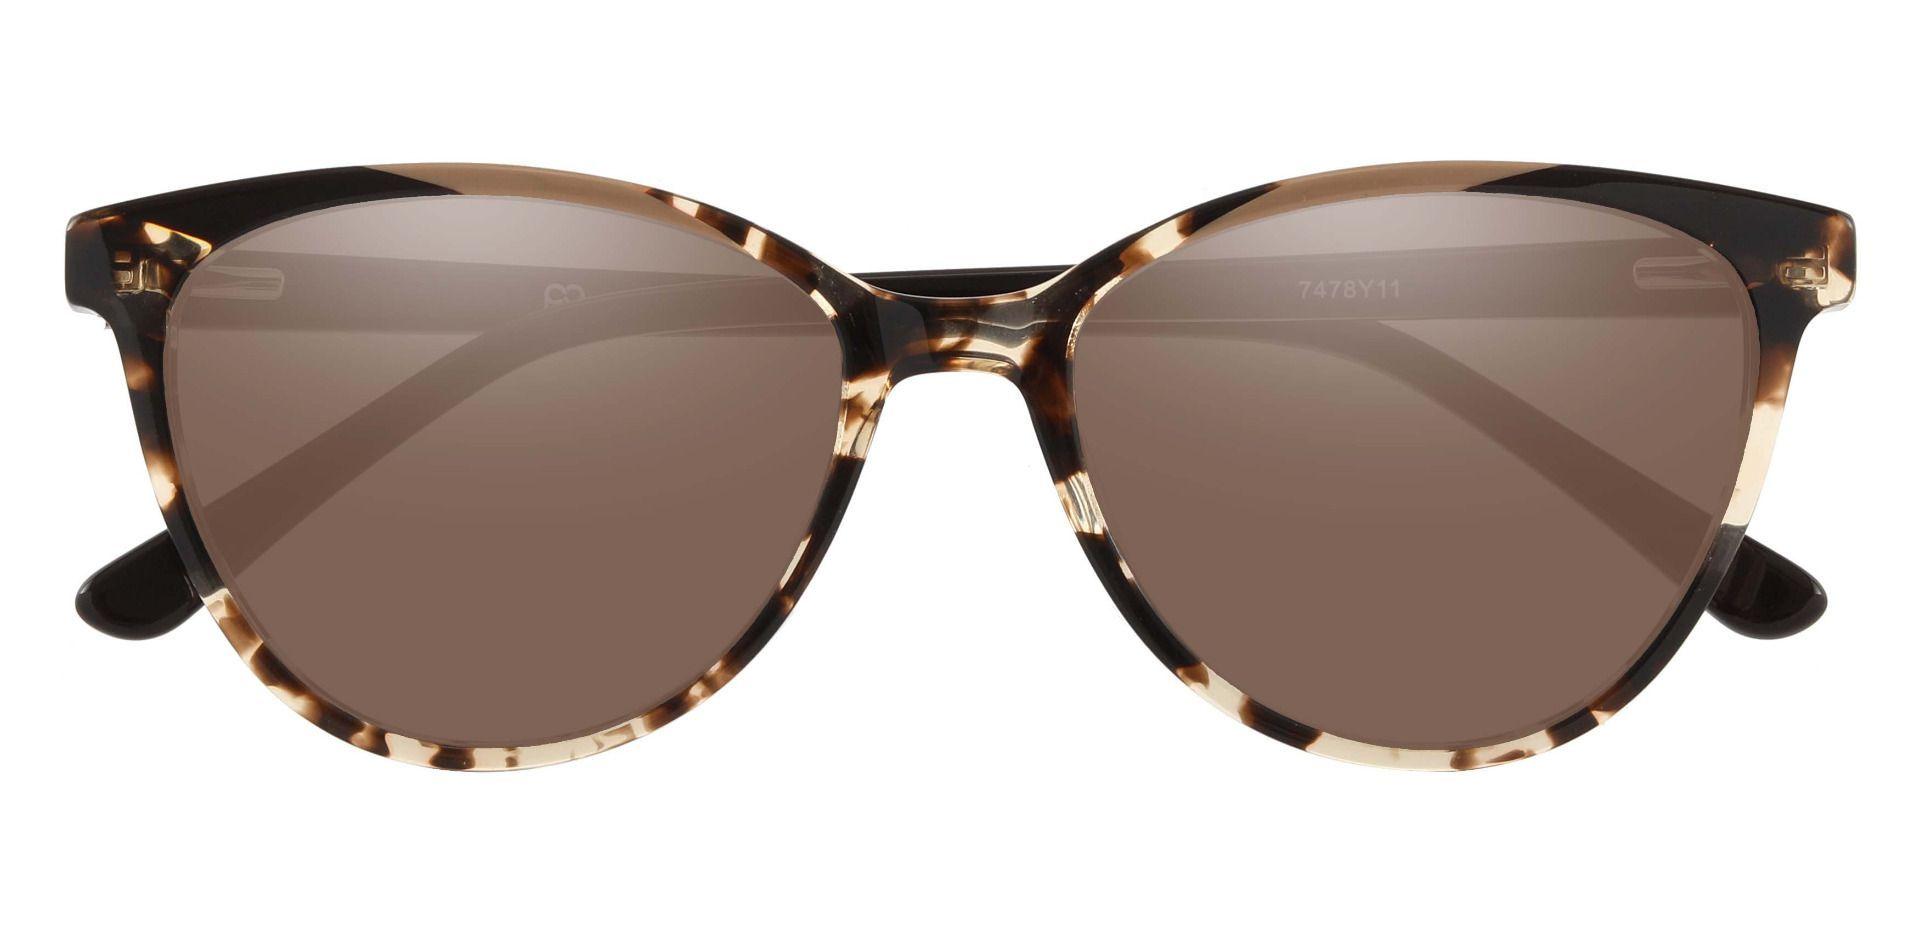 Ravenna Cat Eye Prescription Sunglasses - Multi Color Frame With Brown Lenses